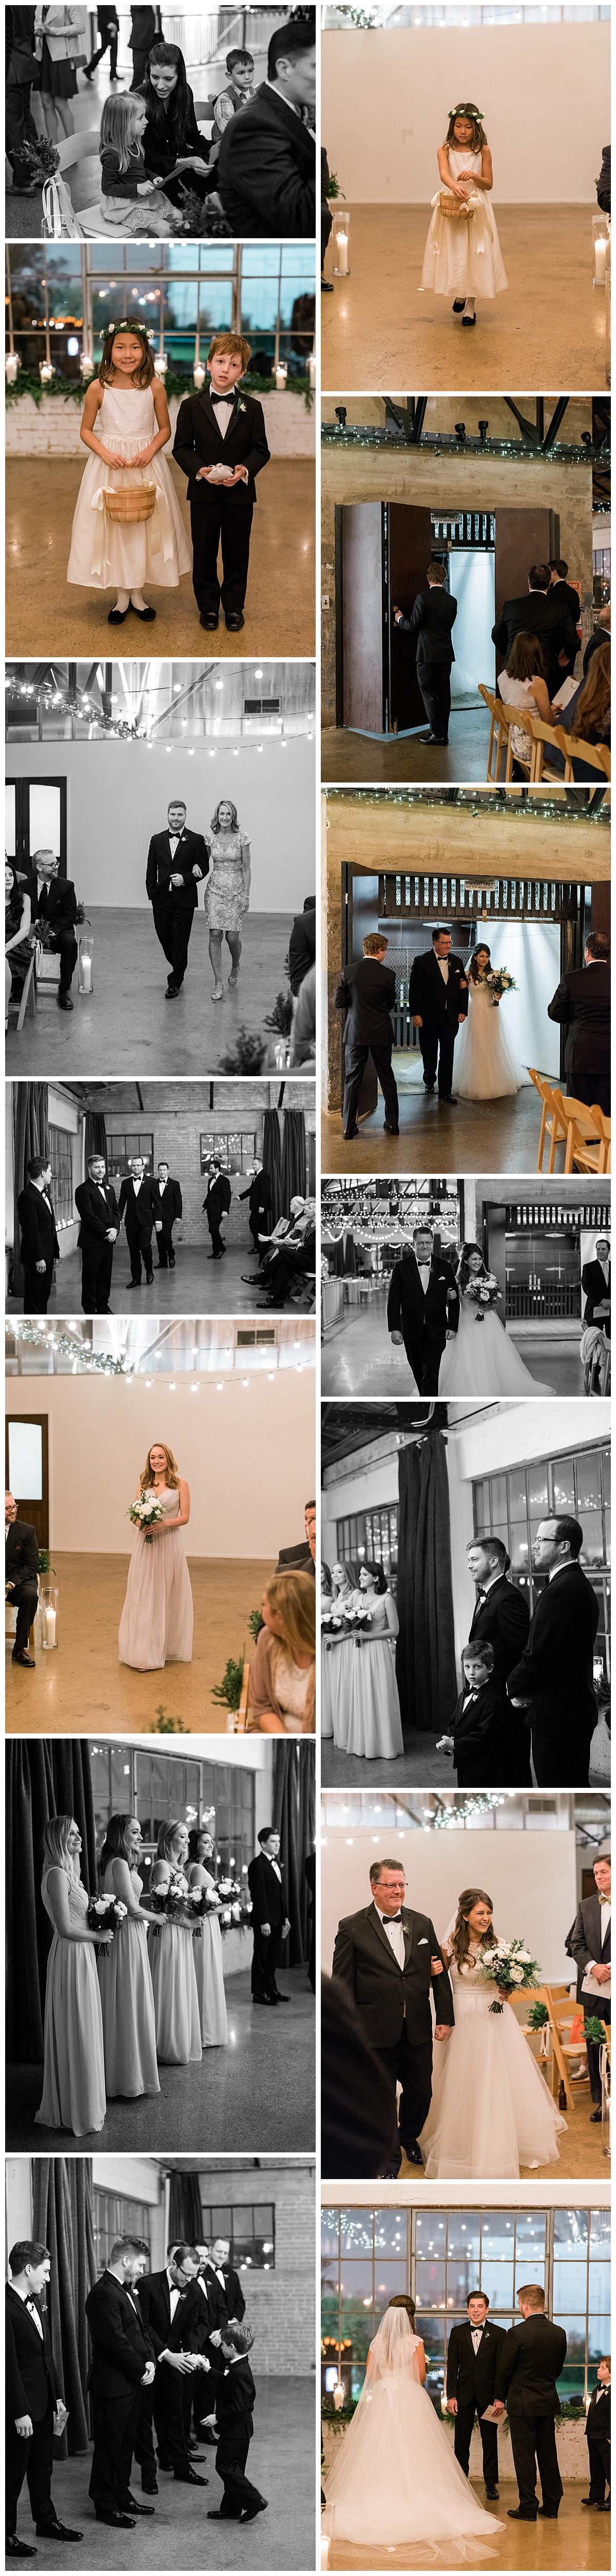 hickory-street-annex-wedding-ar-photography-11.jpg